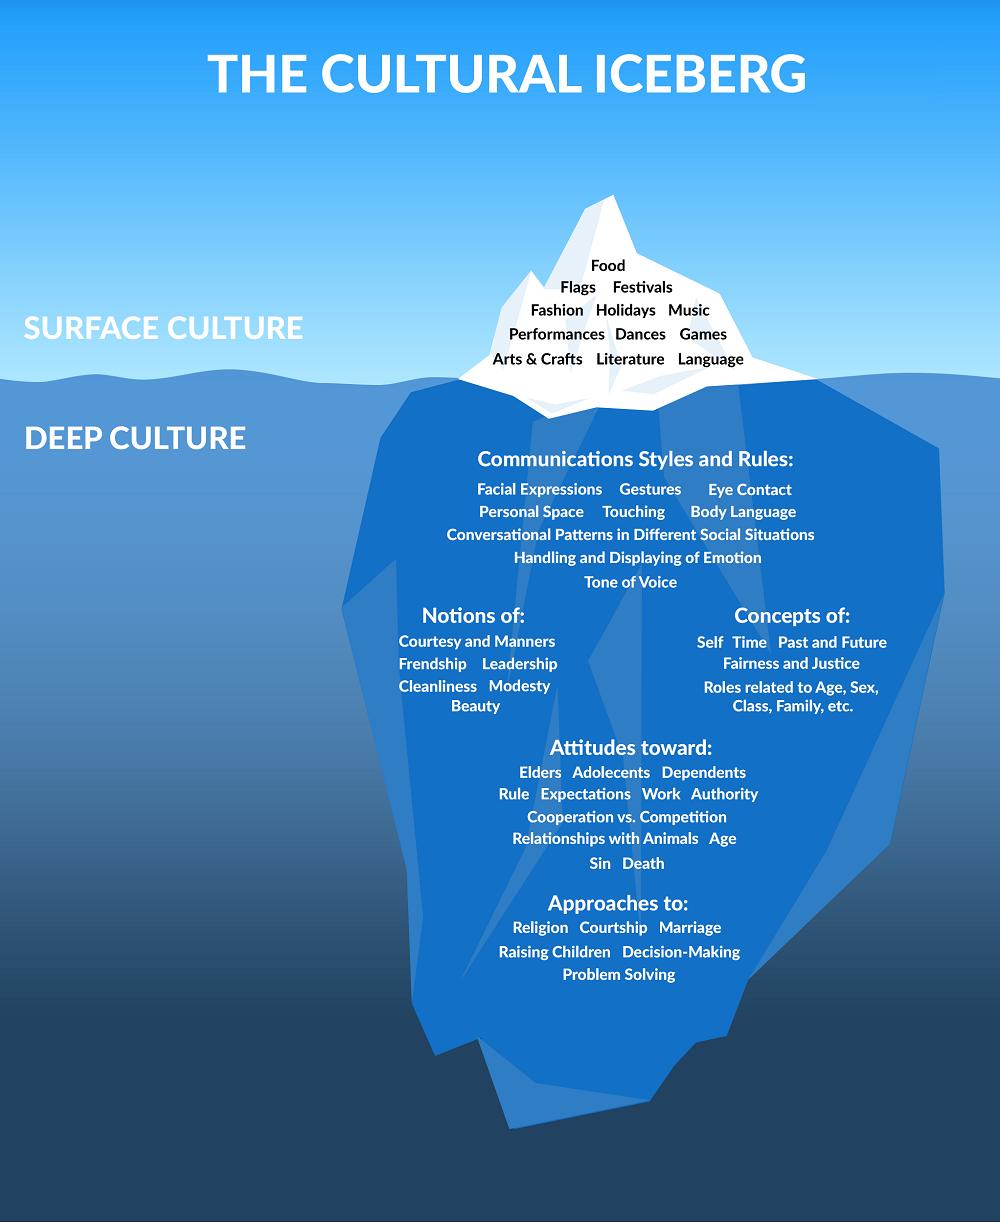 Cultural Iceberg_0.png